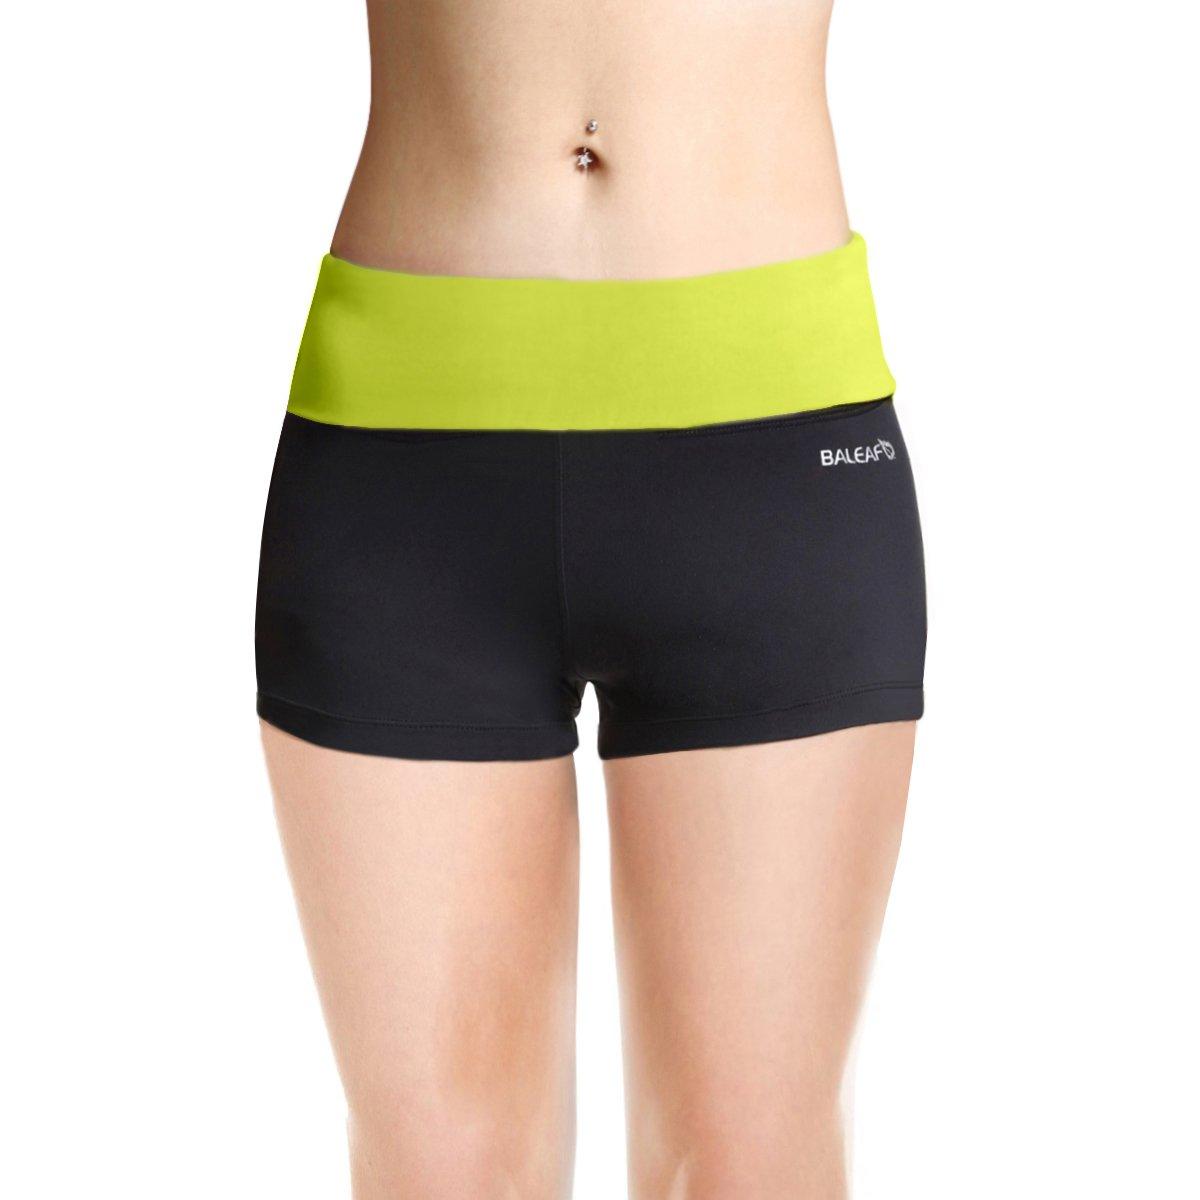 BALEAF Women's High Waist Swim Yoga Volleyball Shorts Running Workout Tennis Athletic Shorts Inner Pocket Lime Punch Size S